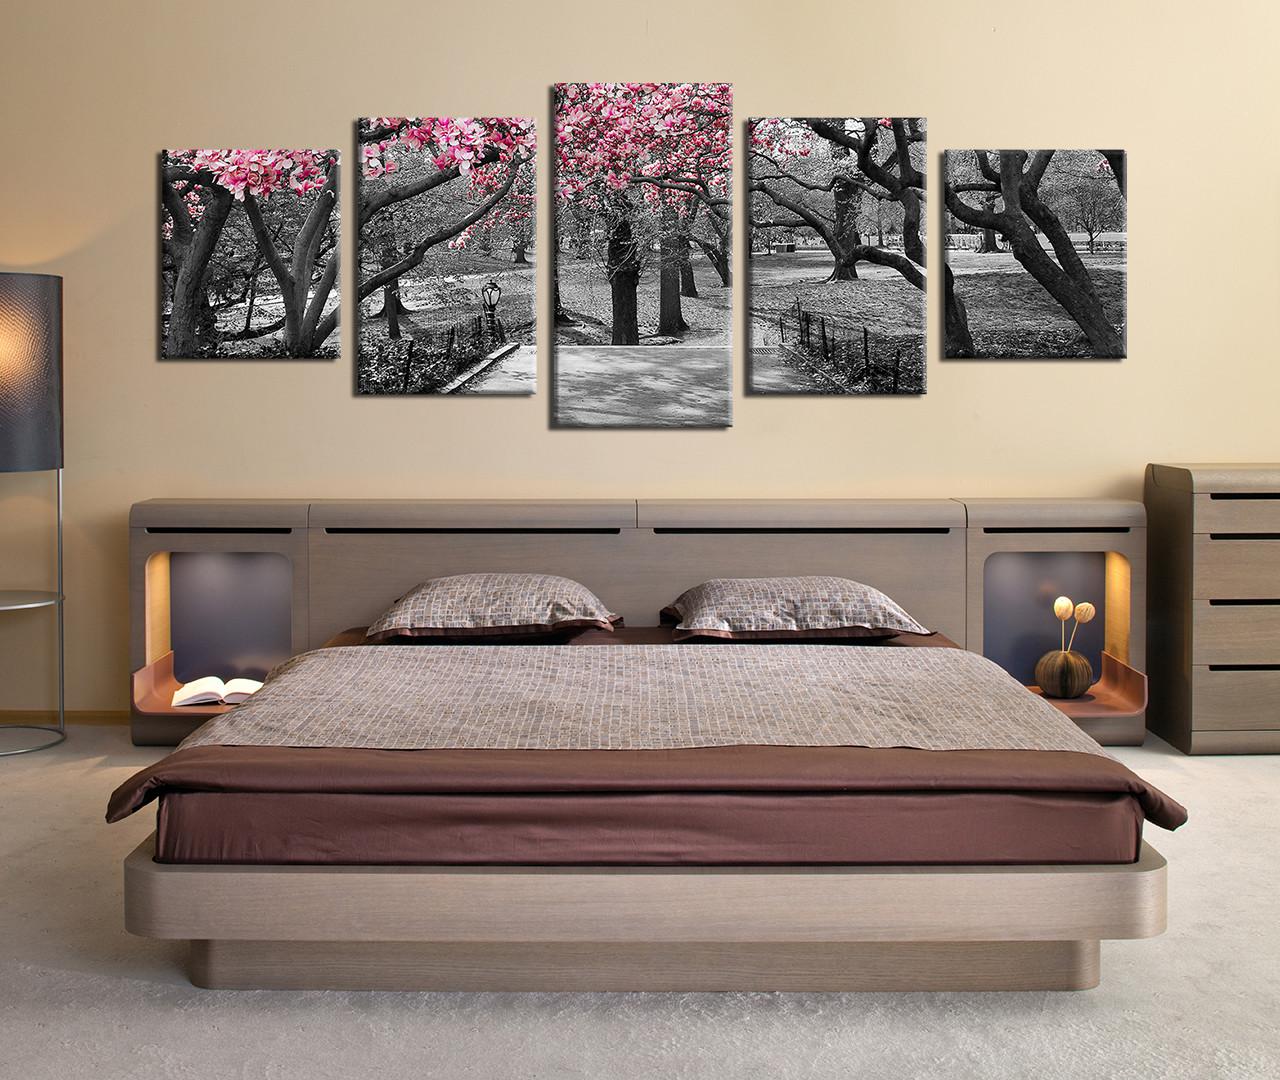 5 piece multi panel canvas grey huge pictures autumn trees wall rh vvvart com bedroom canvas art sets bedroom canvas art sets